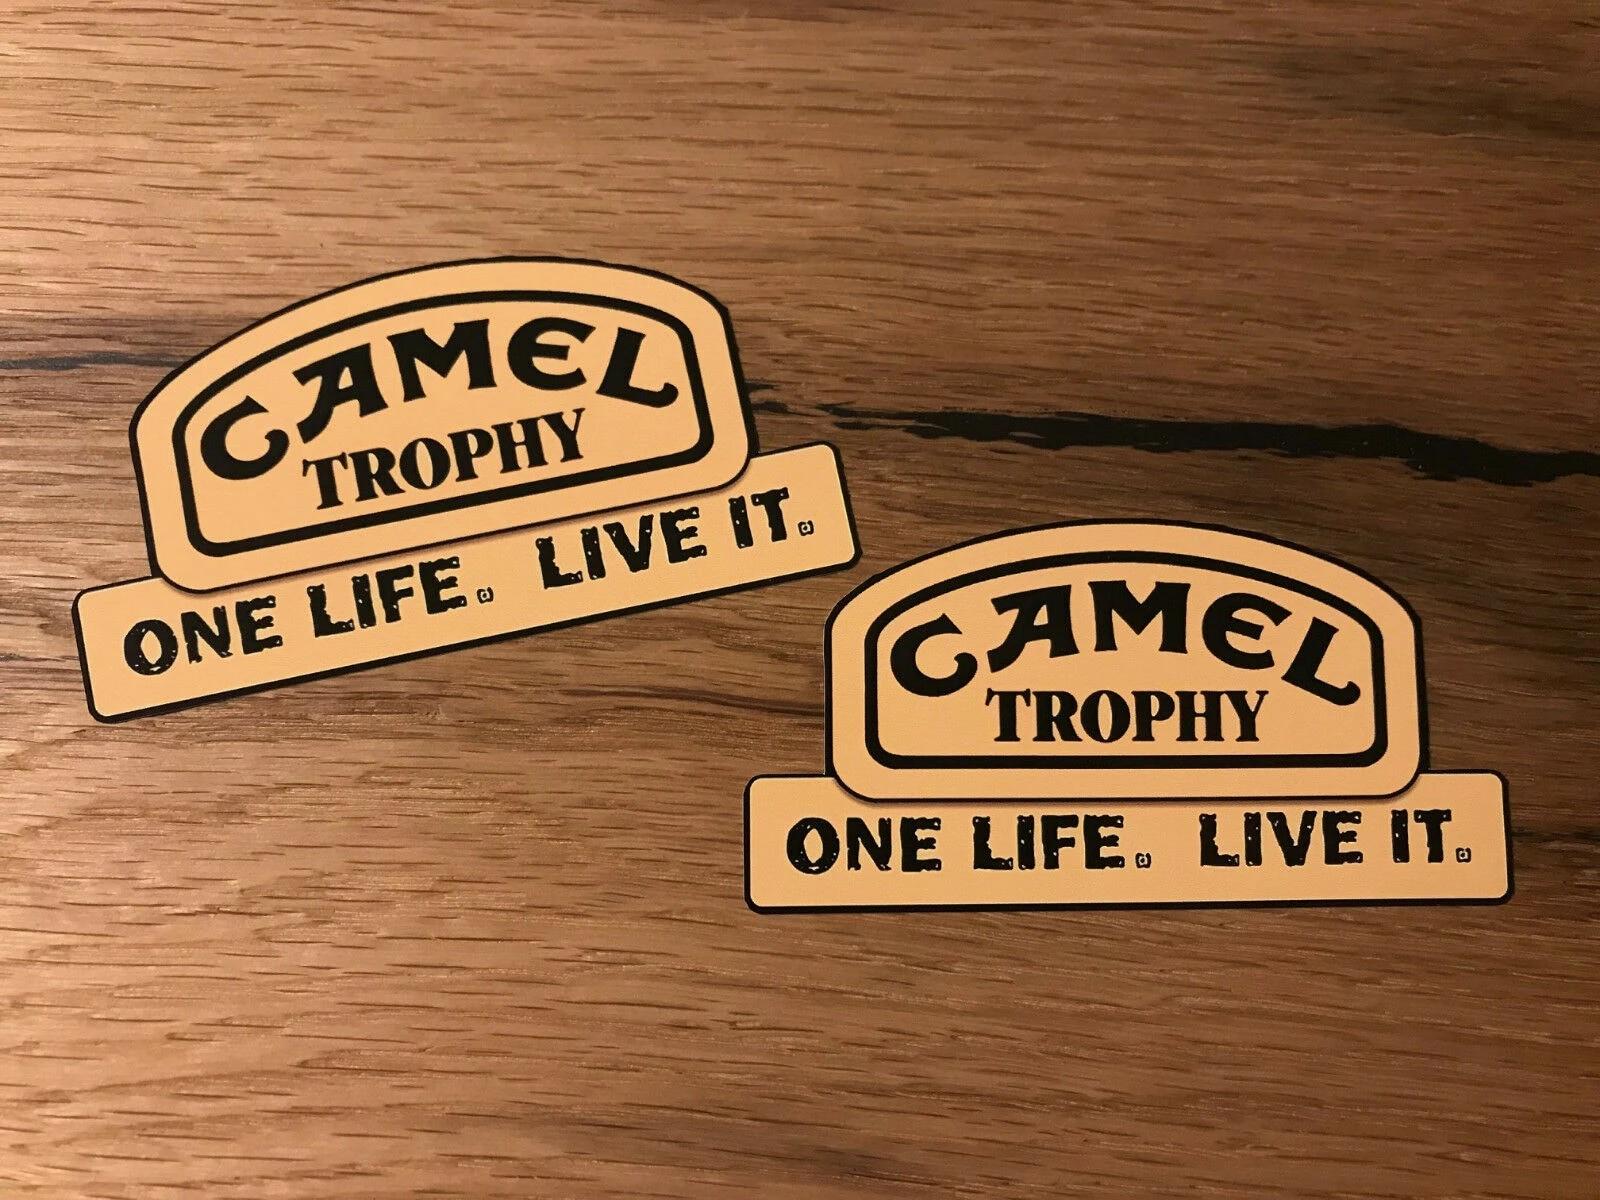 off road rally rf2 4x4 sticker suv all terrain Camel trophy stickers